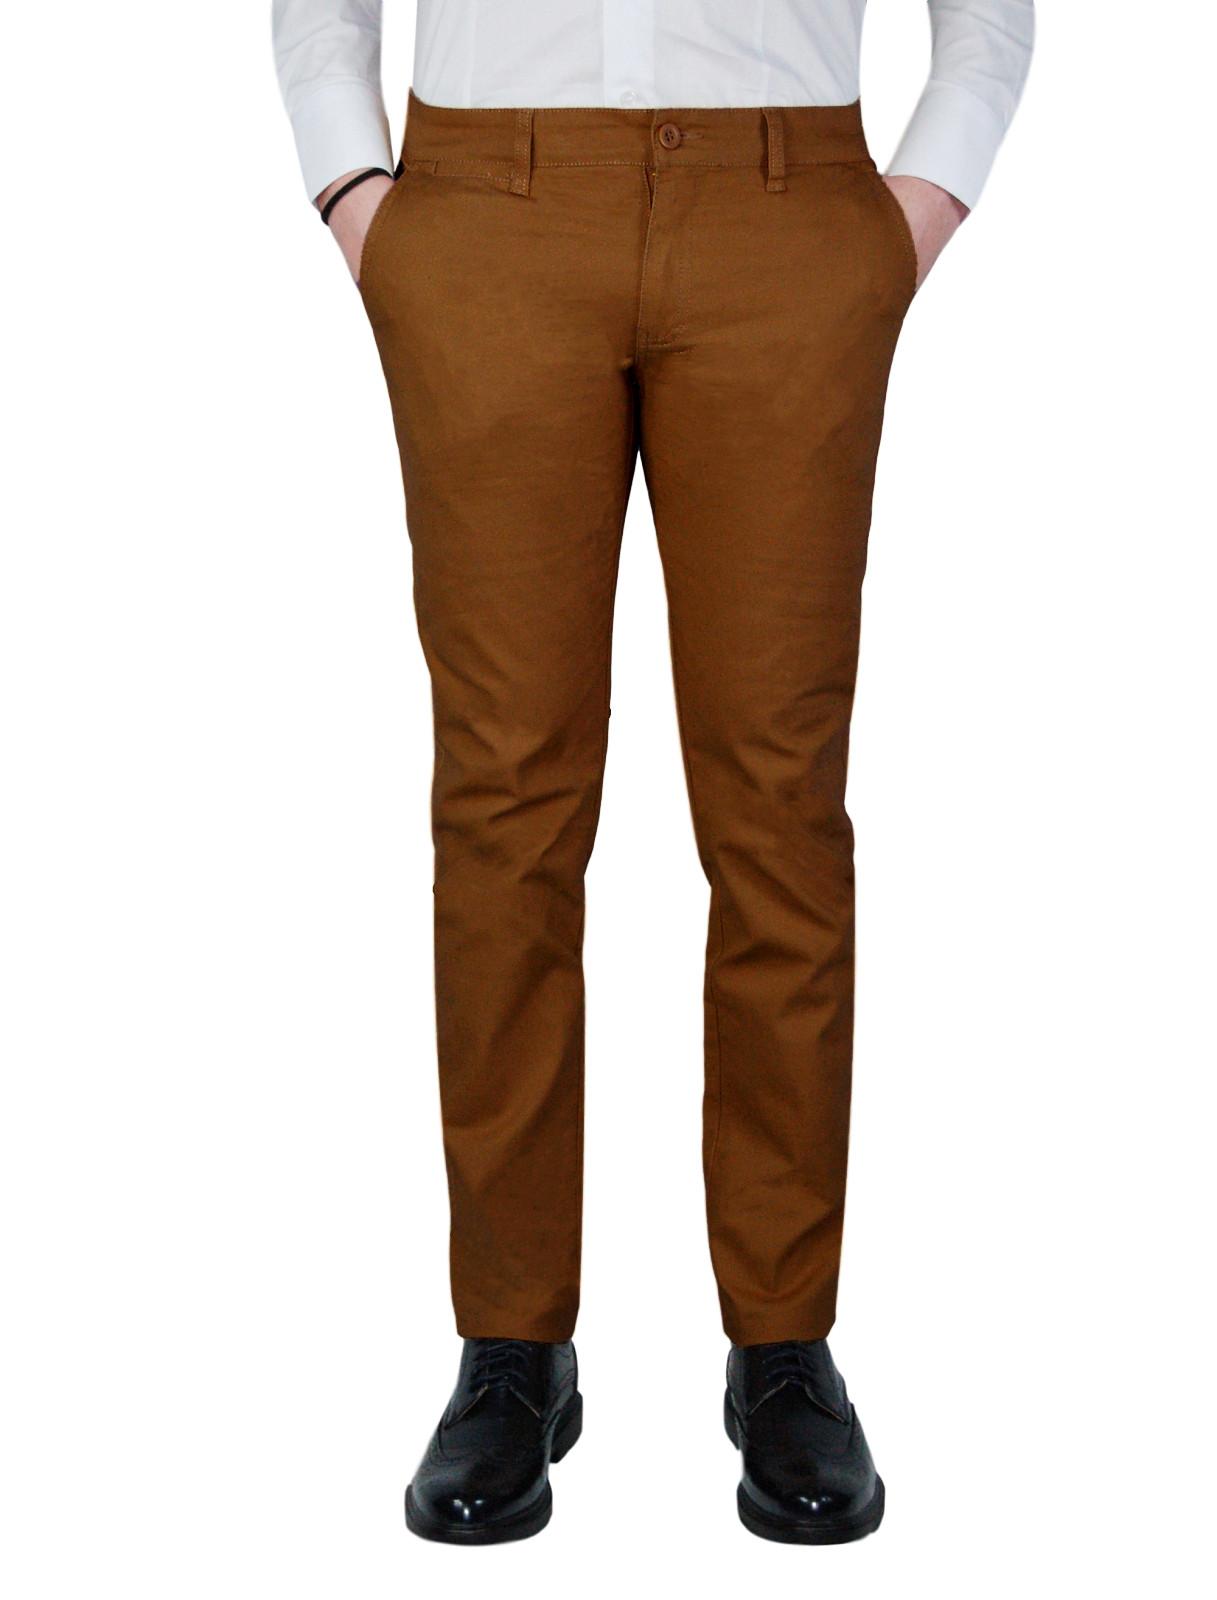 Pantalone-Uomo-Slim-Fit-Chino-Invernale-tasca-america-Cotone-Blu-Nero-Verde miniatura 28